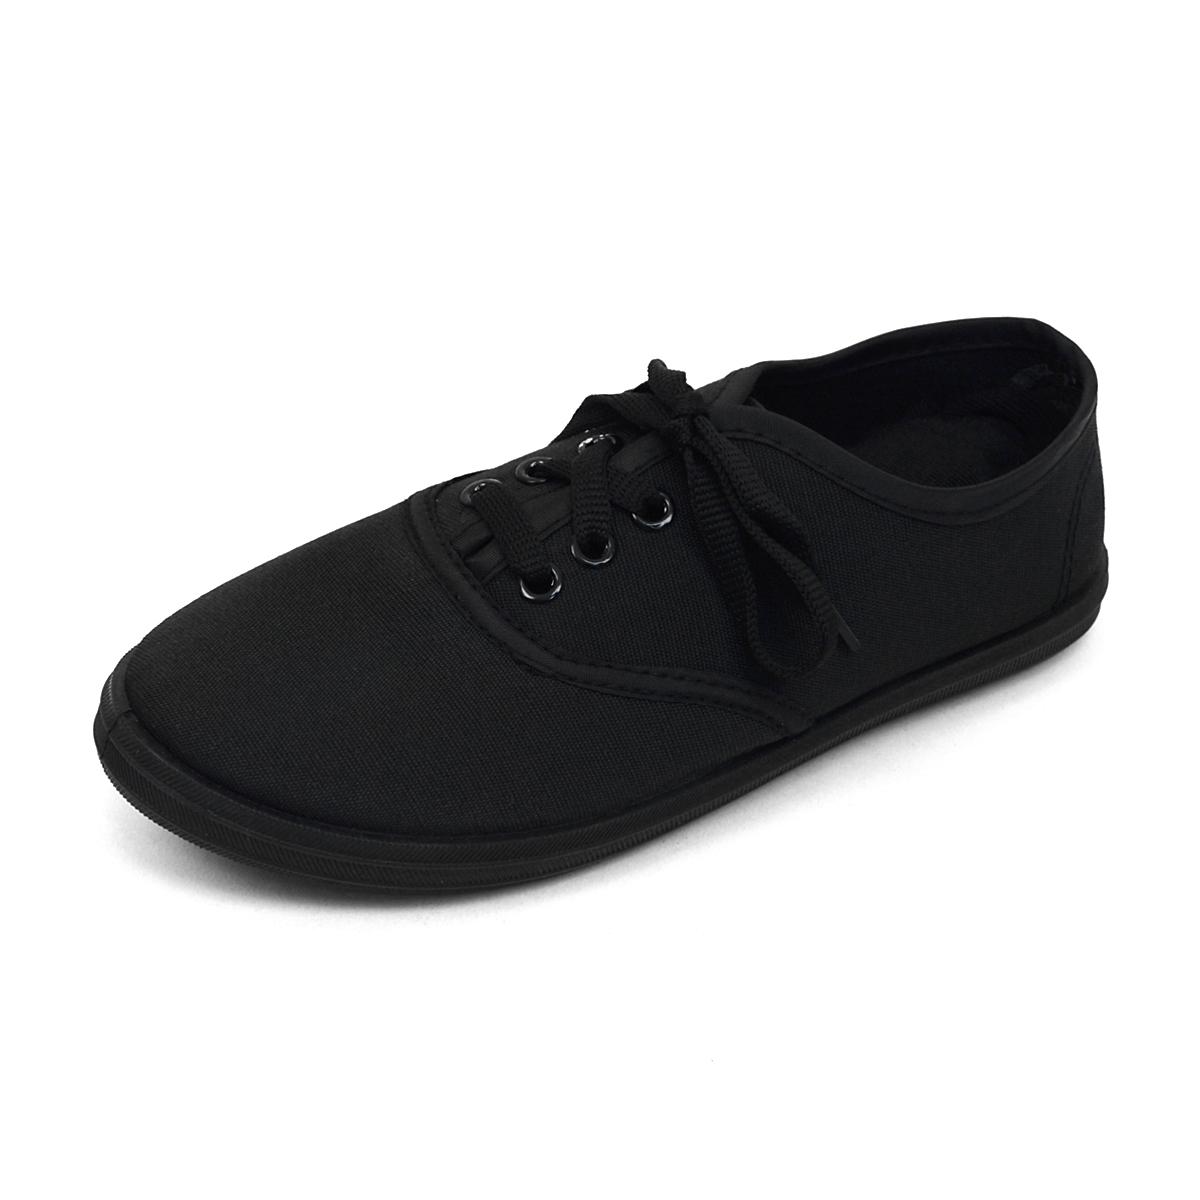 18pcs Women's Canvas Flat Black Casual Shoes SNEAKERS